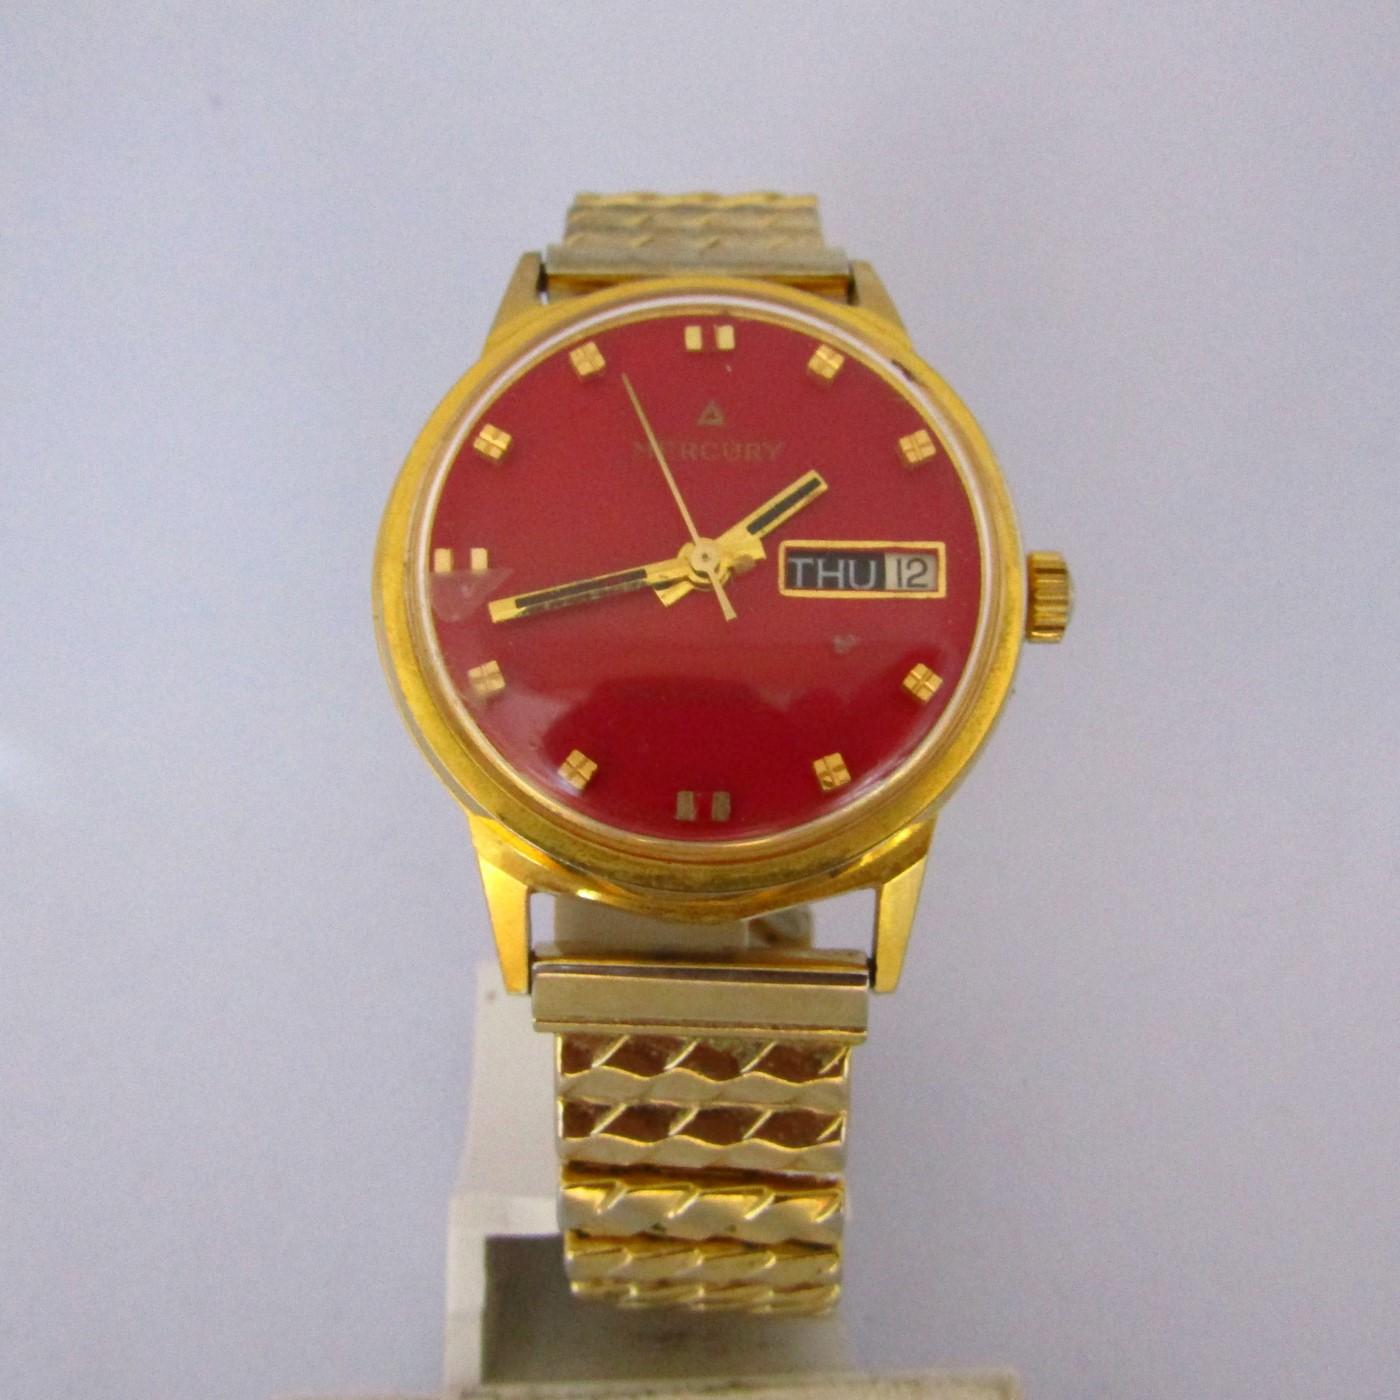 MERCURY LIFETIME MAINSPRING. Reloj de pulsera para caballero, Suiza, ca. 1980.